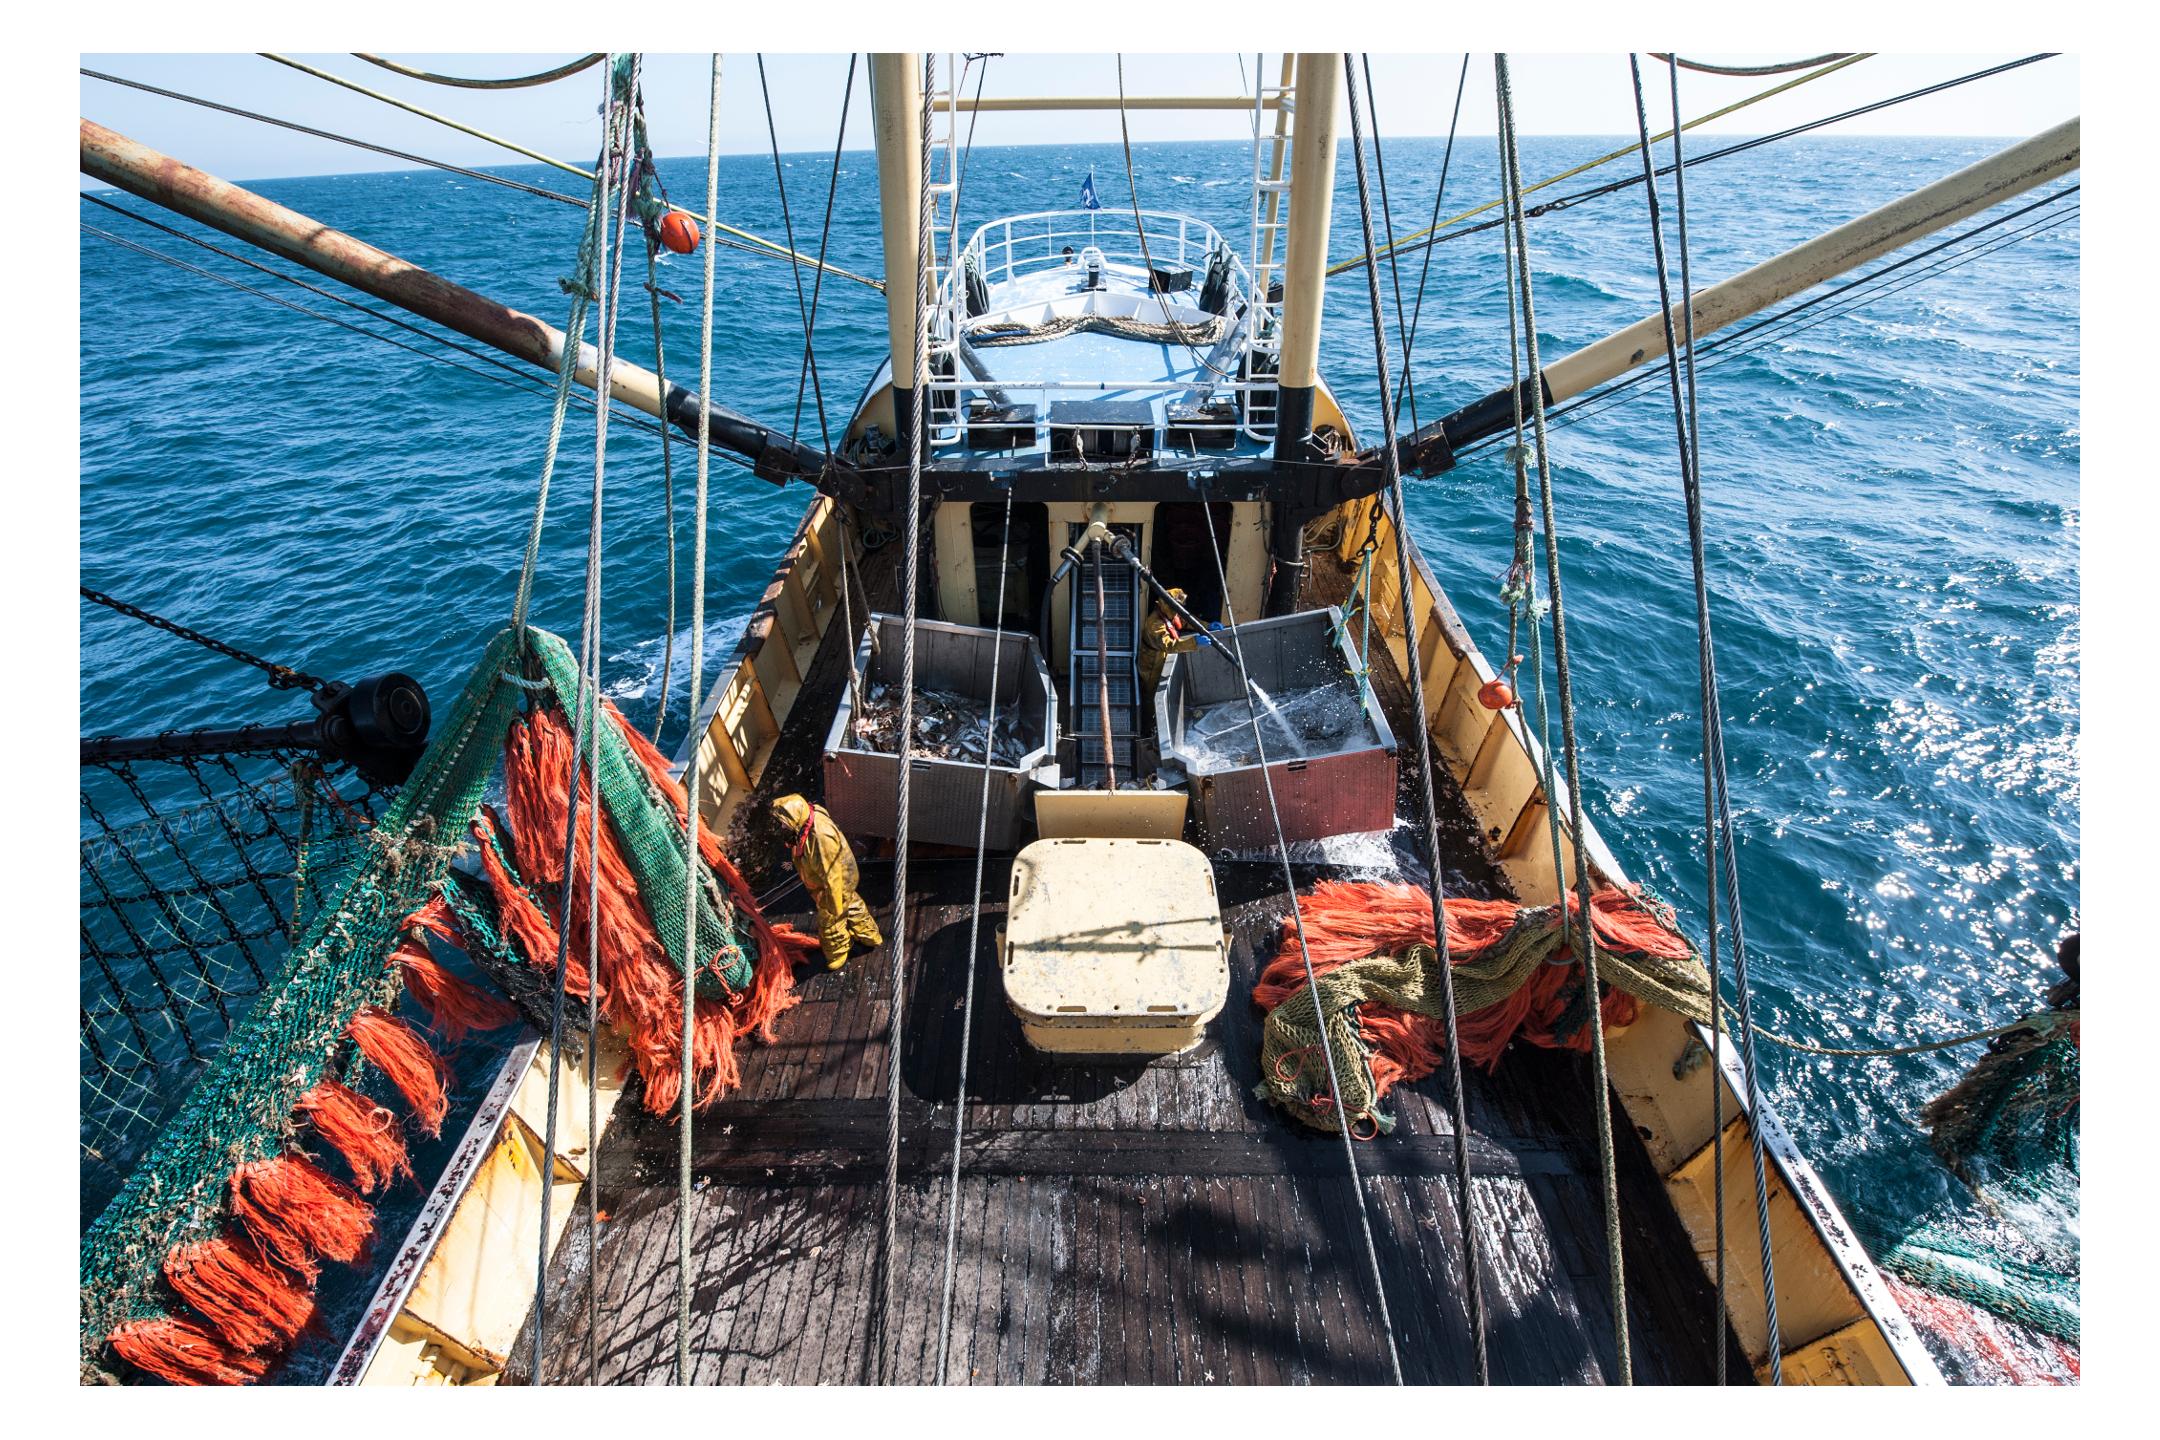 waterdance_beam_trawlers_1.jpg